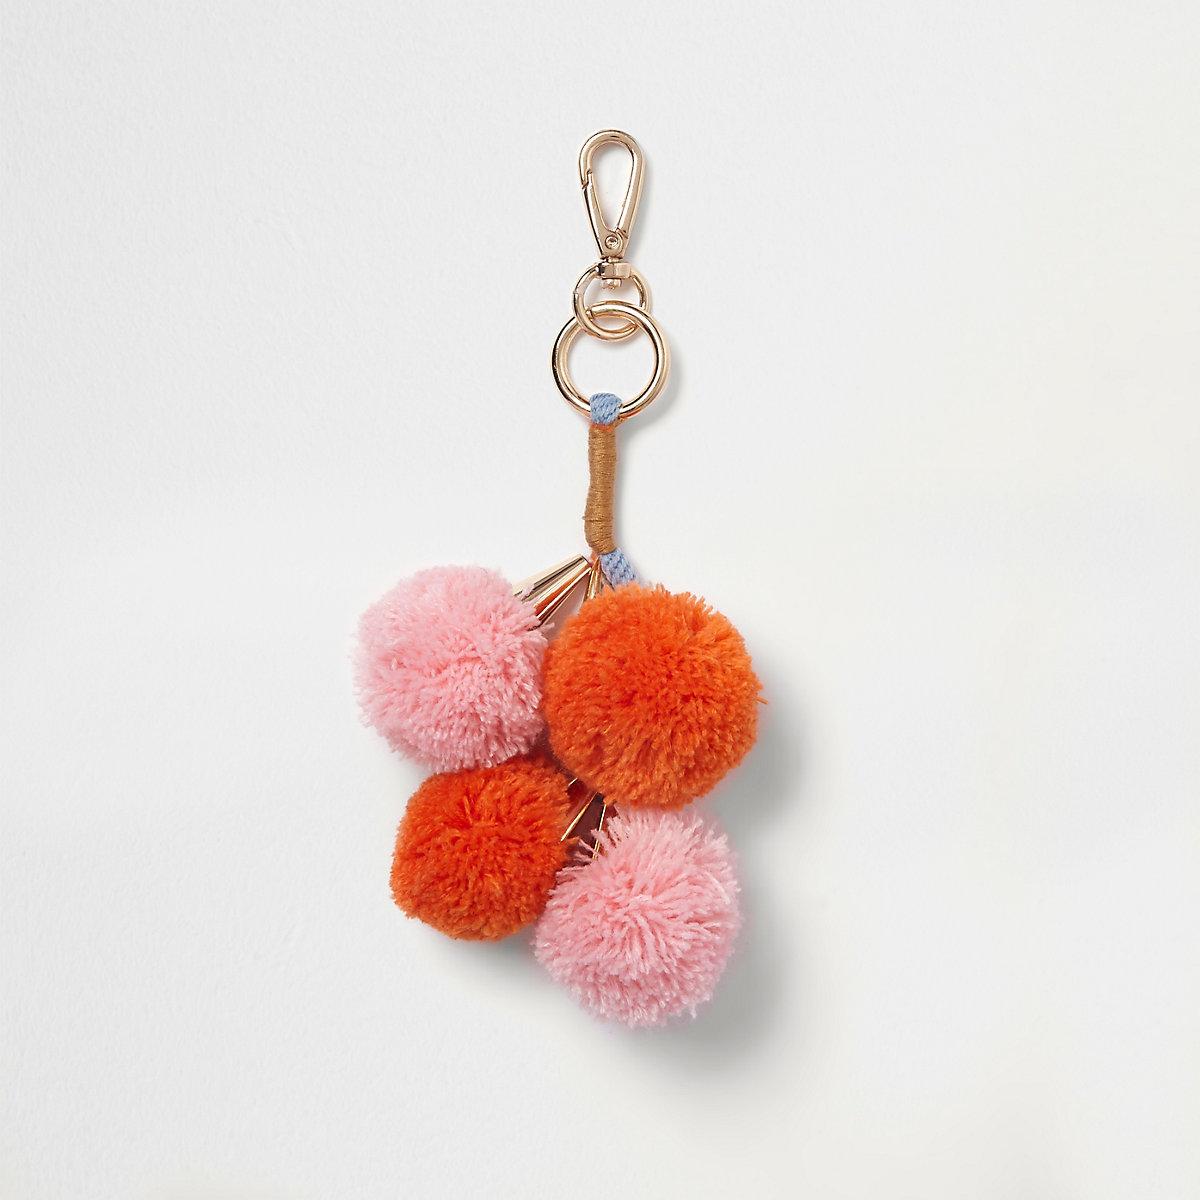 Pink and orange pom pom charm clip on keyring